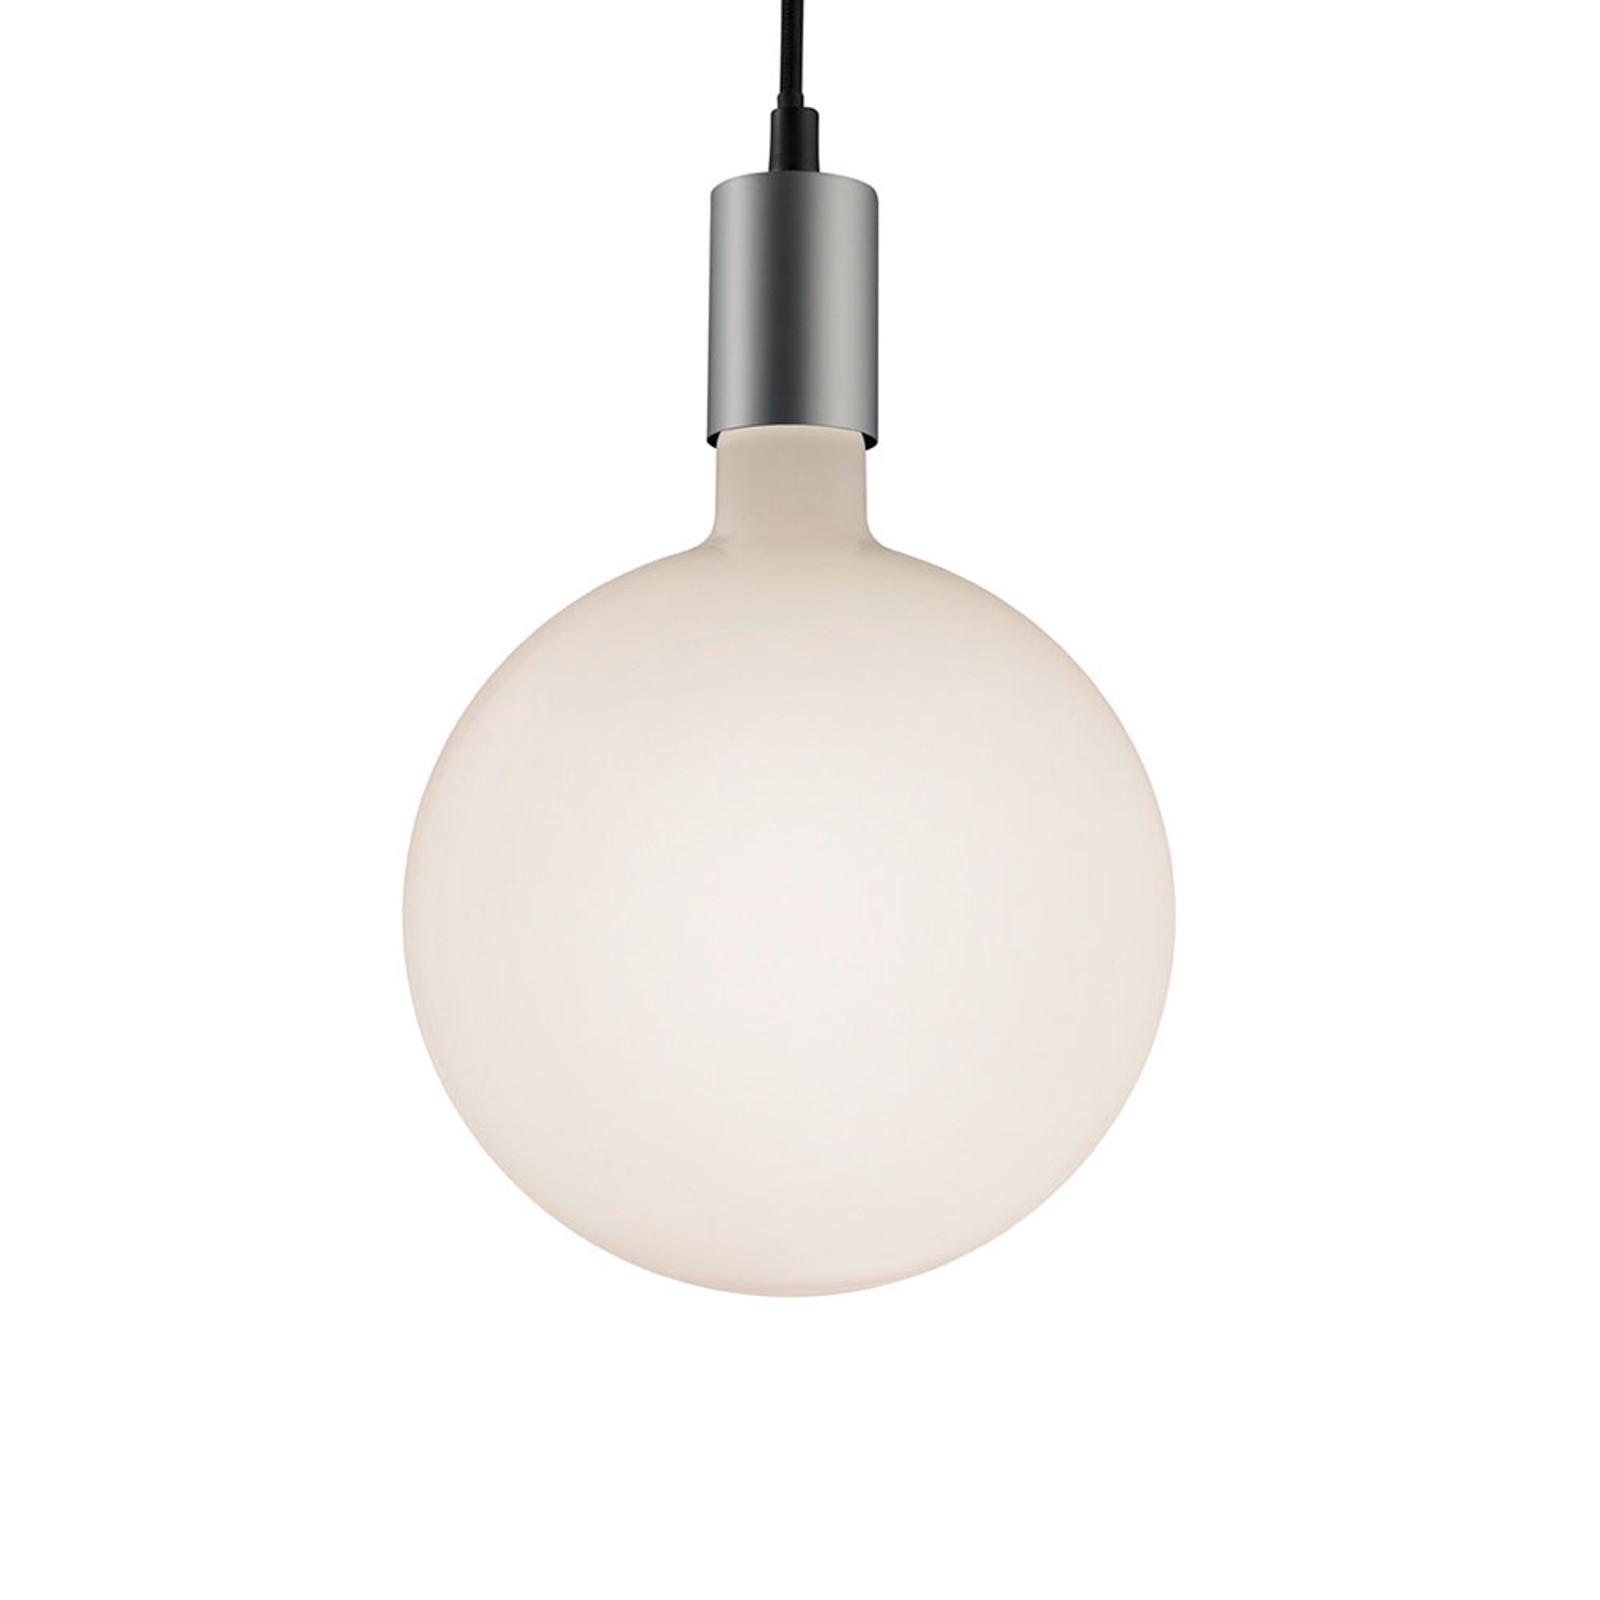 WiZ E27 LED-globepære 6,5 W 650lm dimbar CCT matt